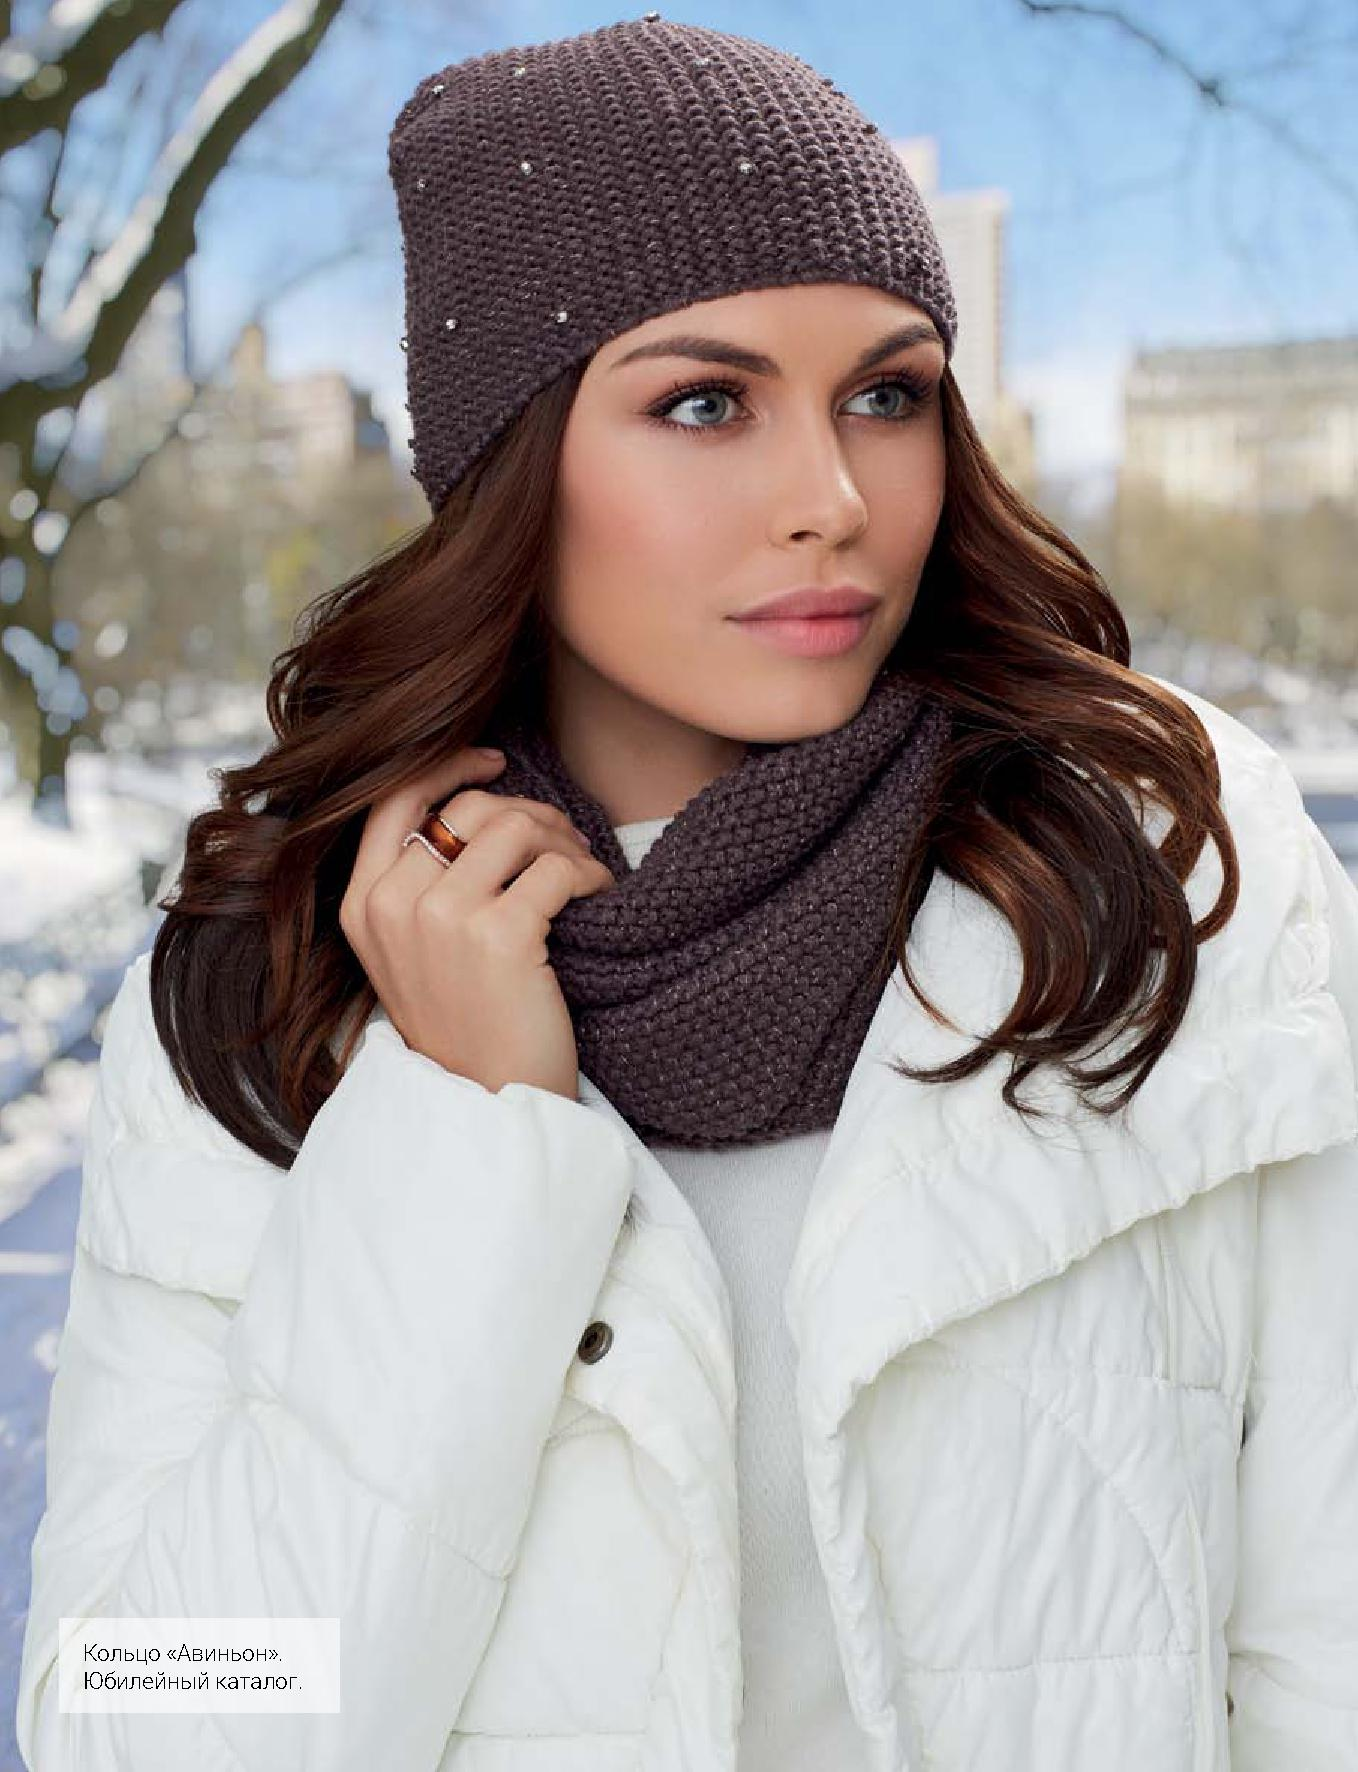 Флоранж Стайл - шарф хомут и шапка Портобелло